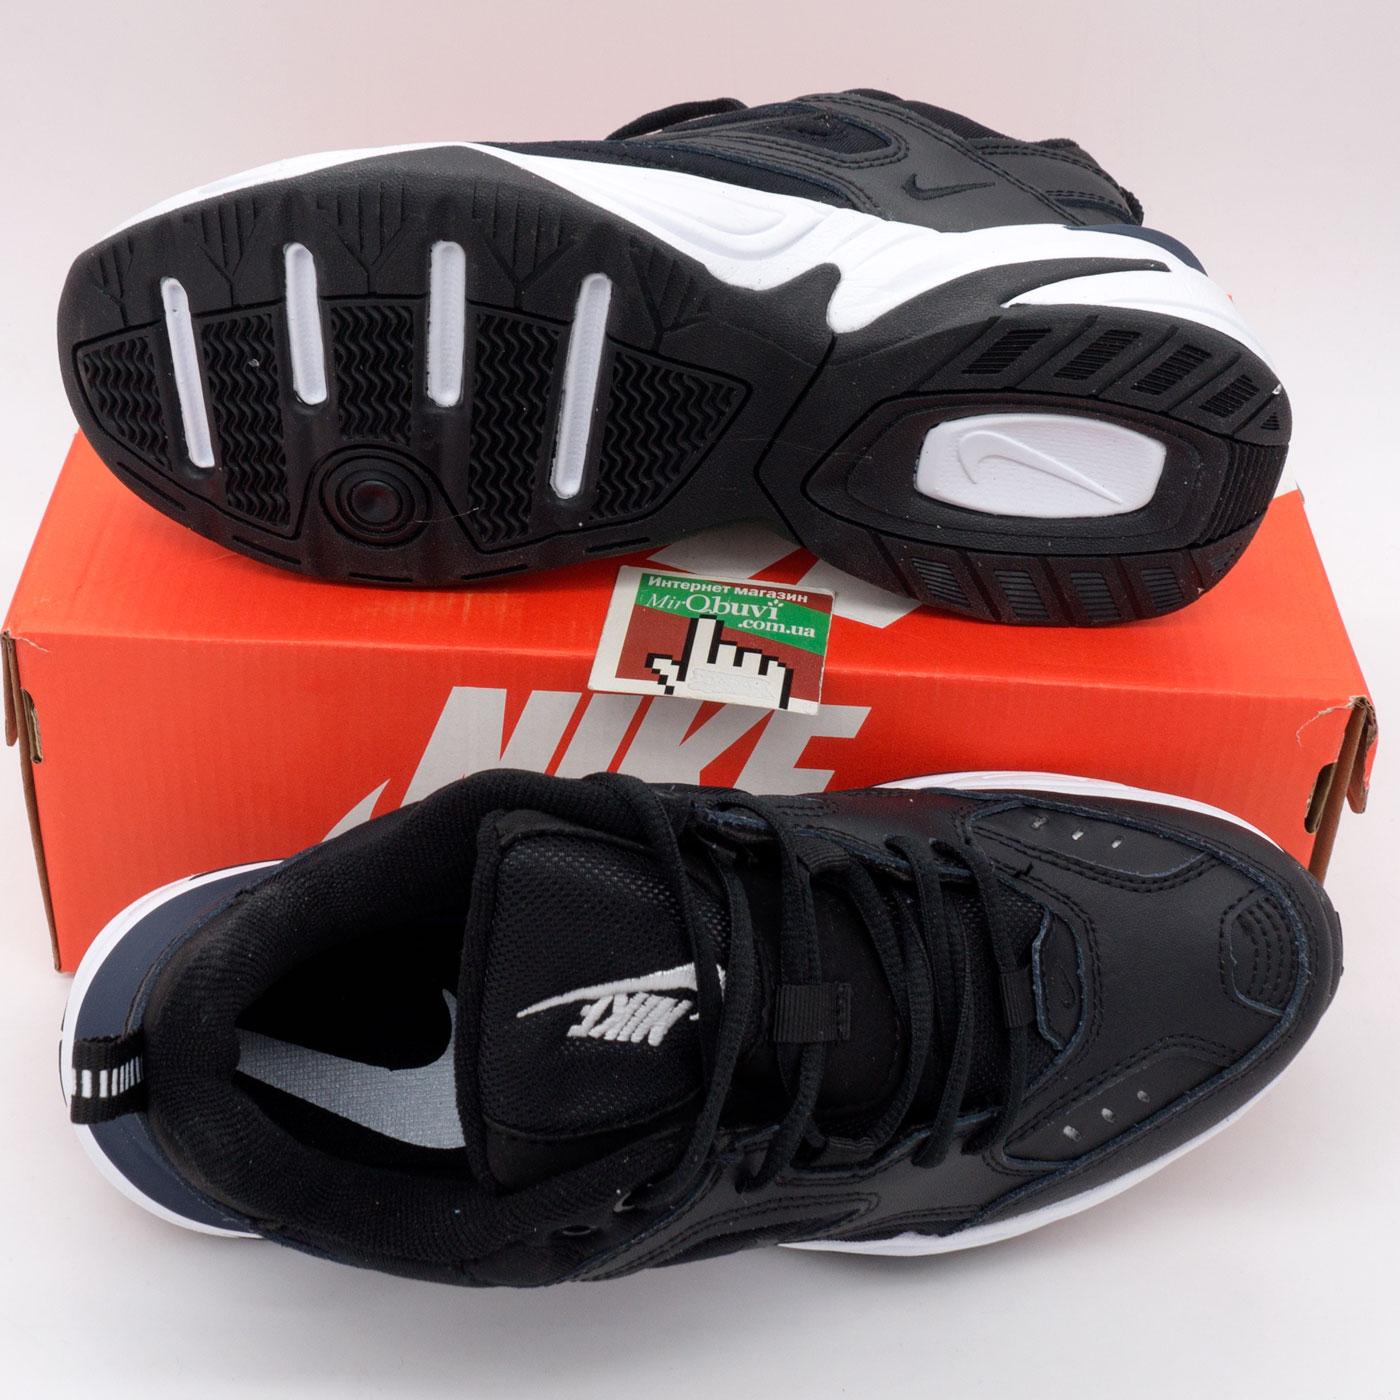 фото bottom Кроссовки Nike M2K Tekno черно-белые. Топ качество! bottom